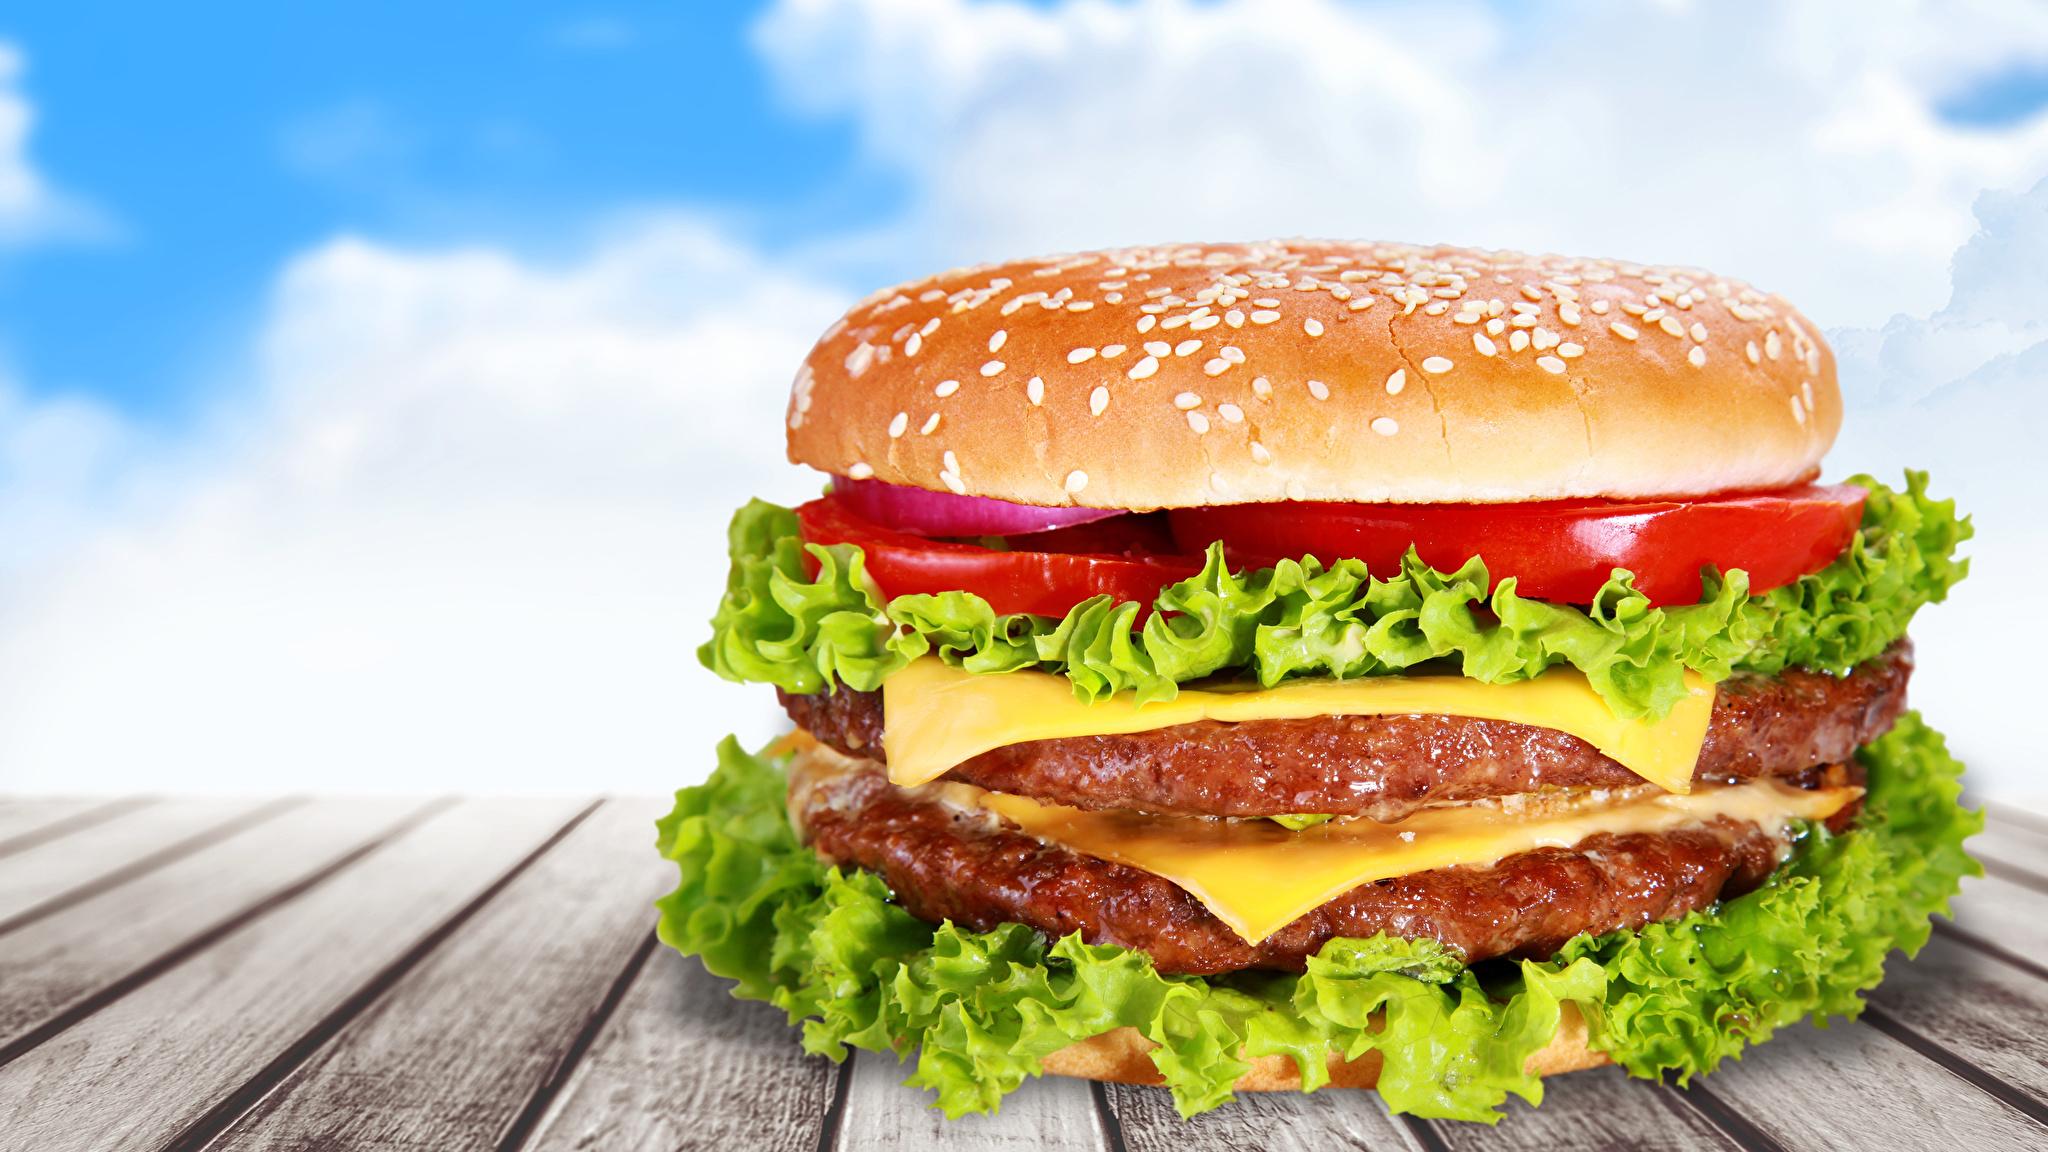 Fotos Hamburger Fast food Gemüse Lebensmittel Bretter 2048x1152 Burger